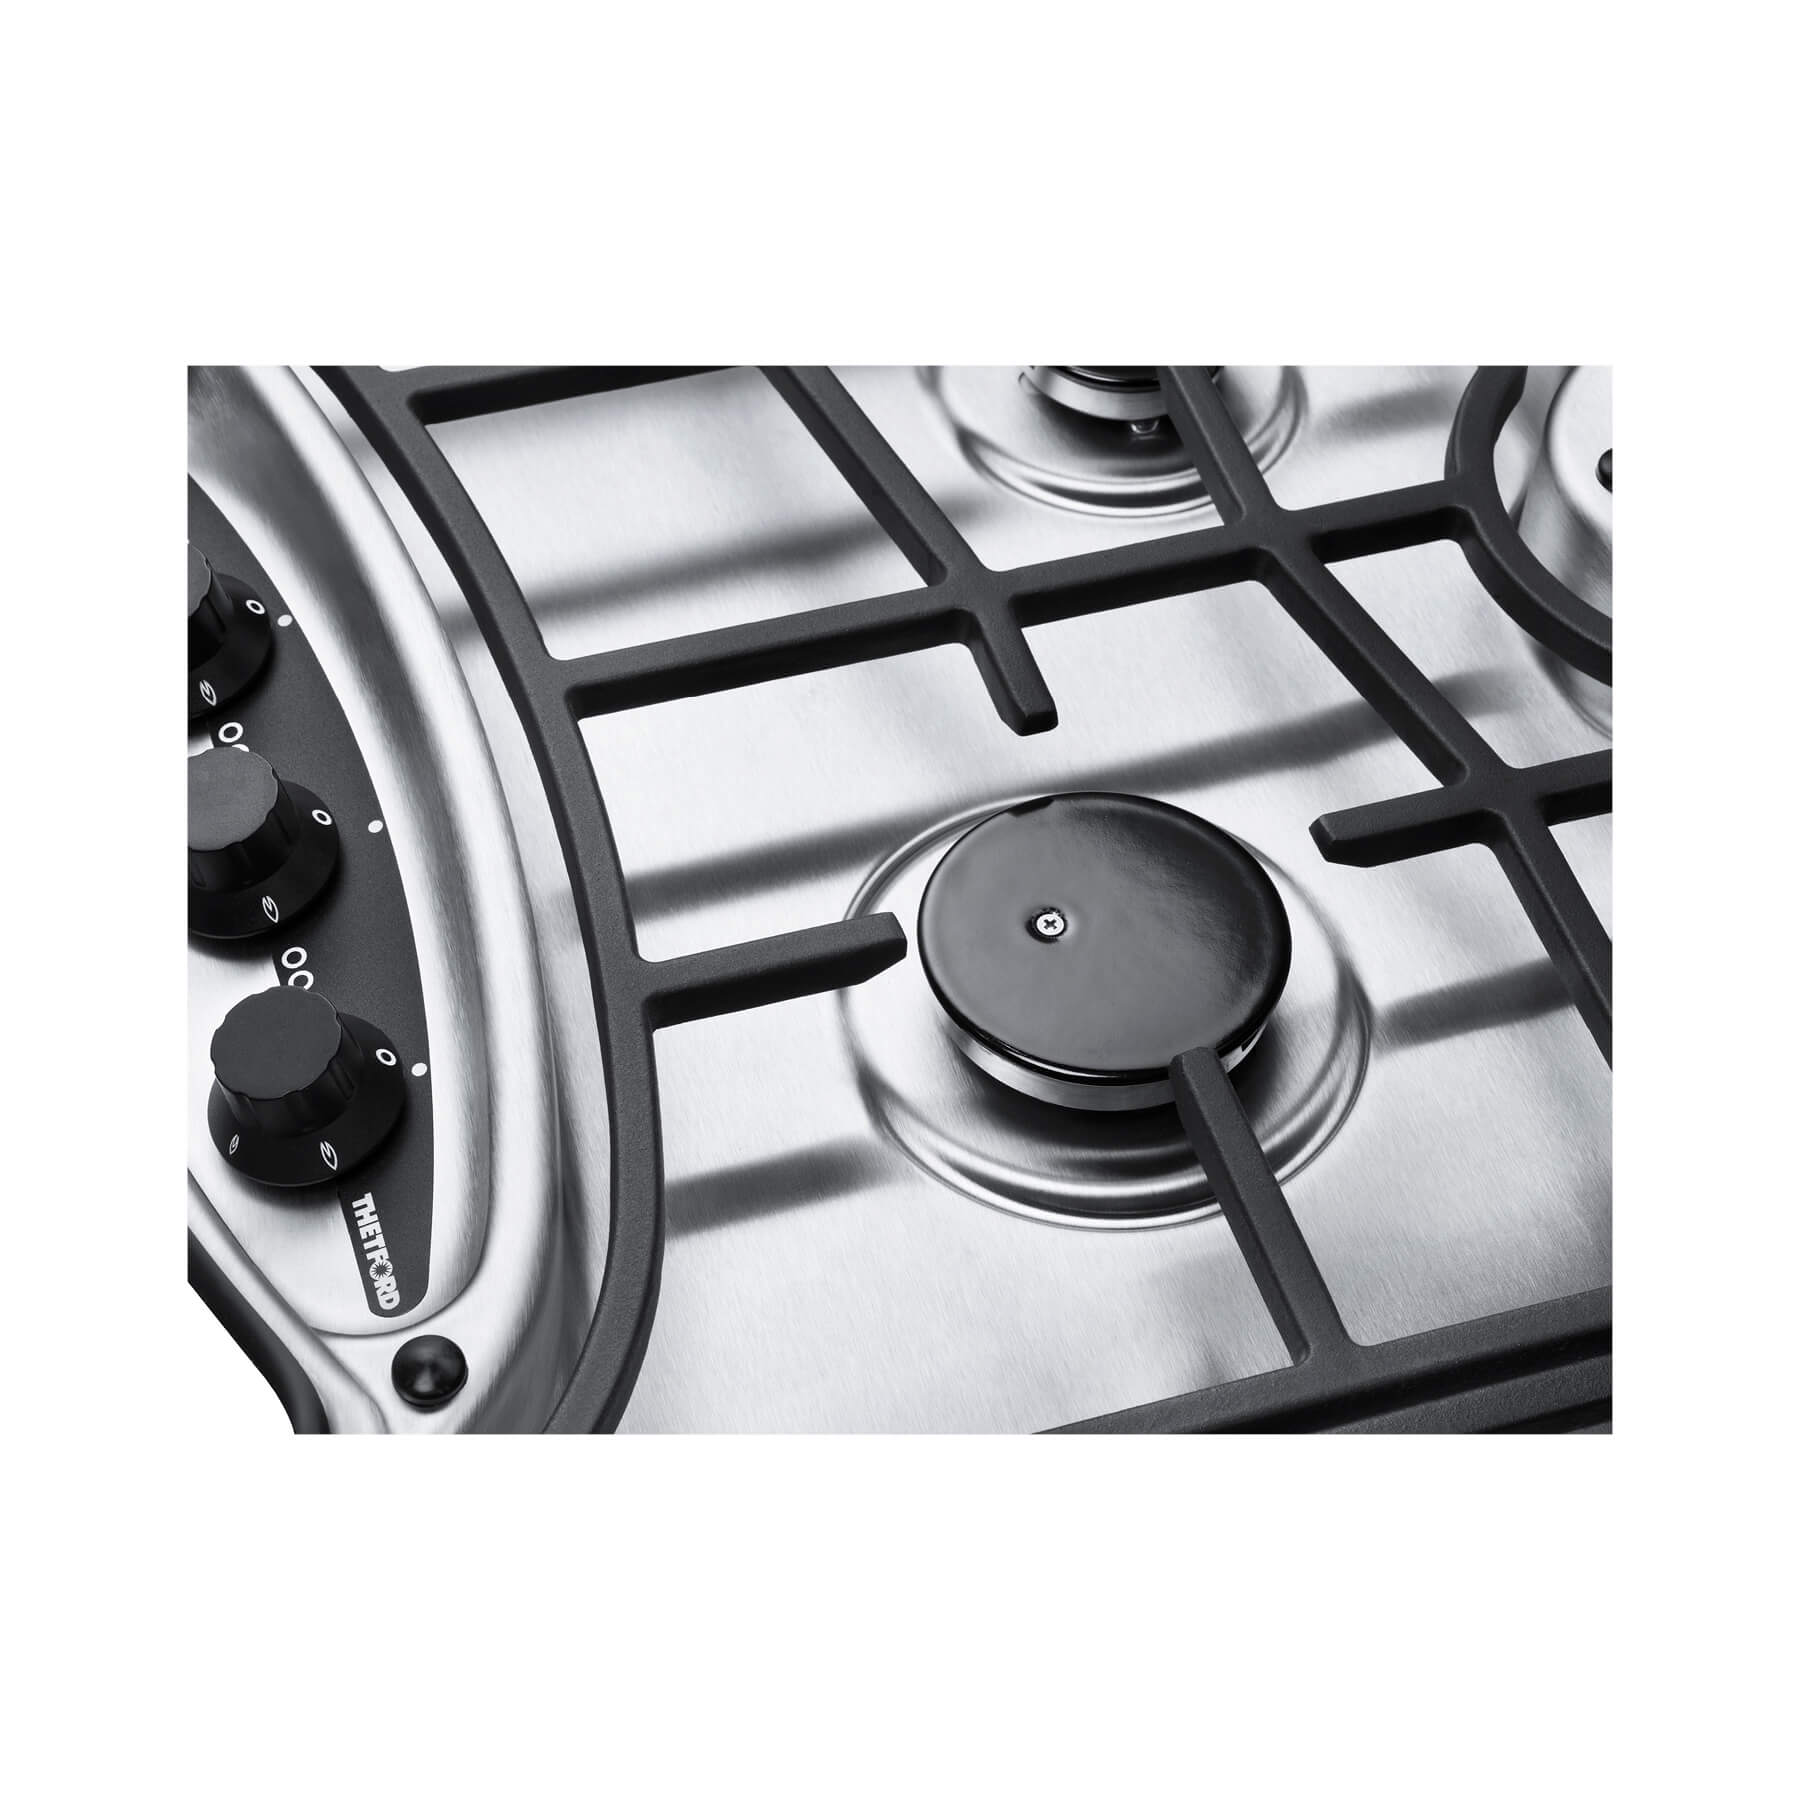 cooking&kitchen appliances